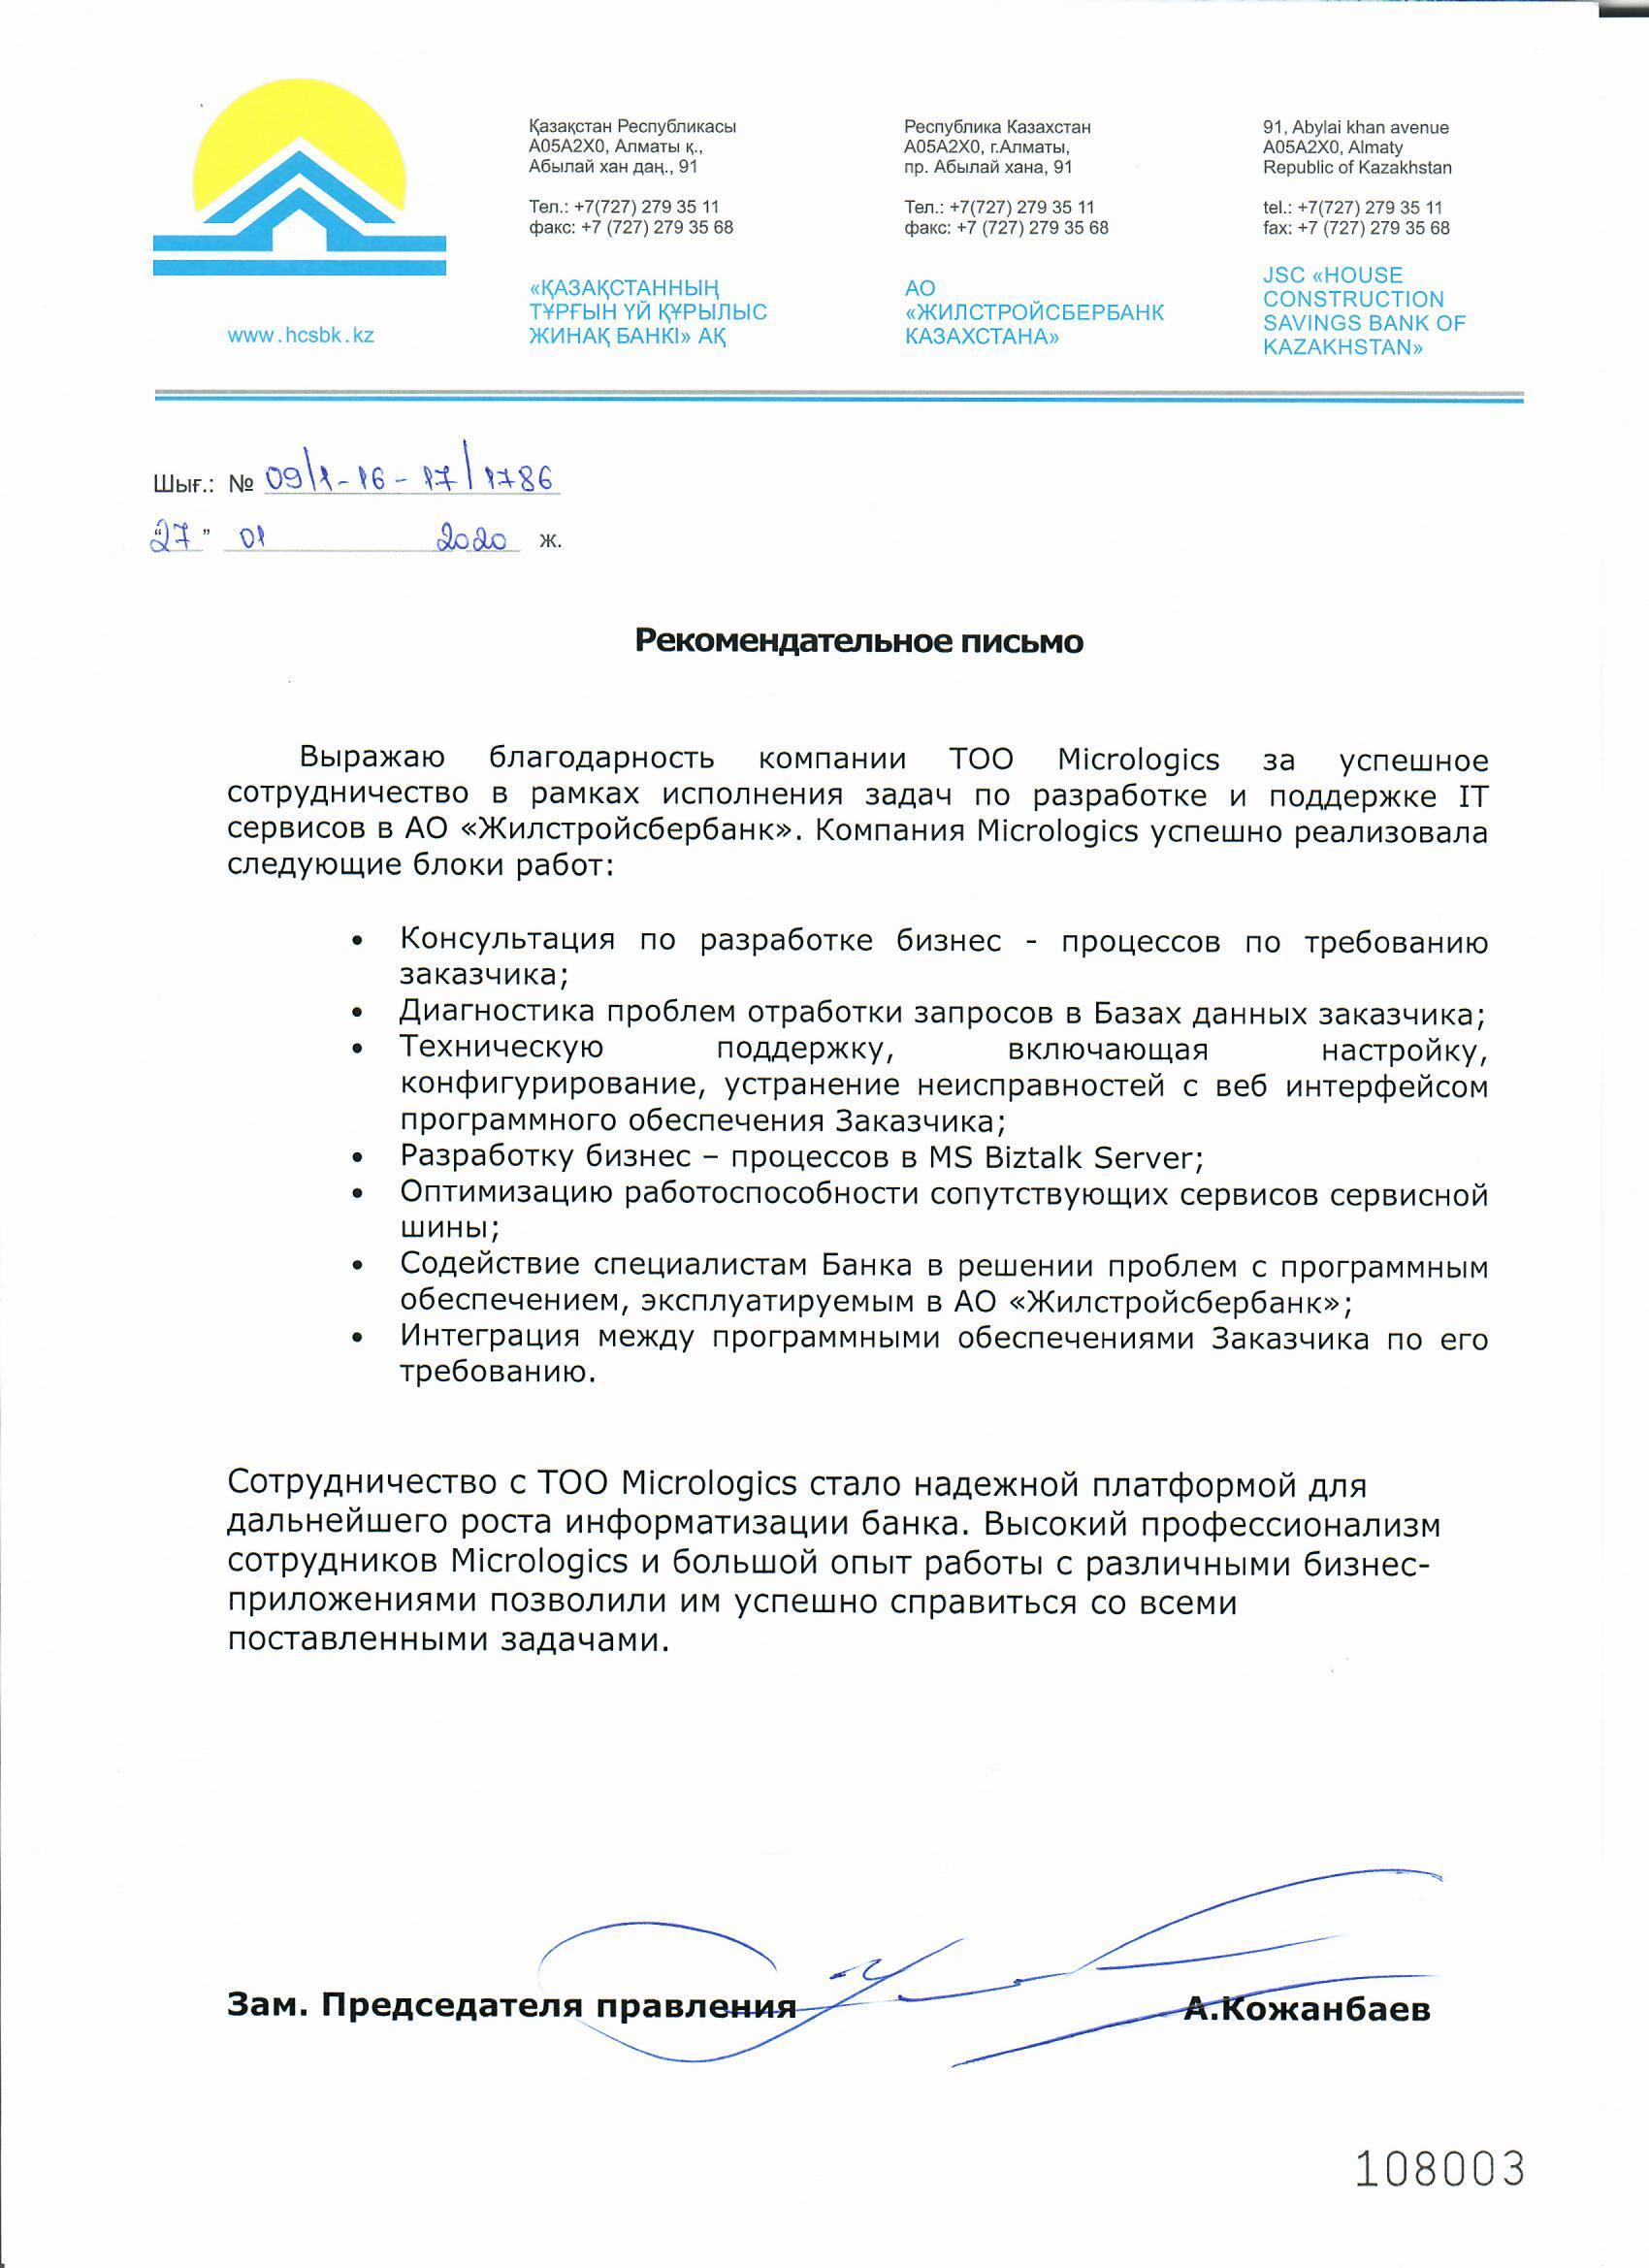 АО Жилстройсбербанк